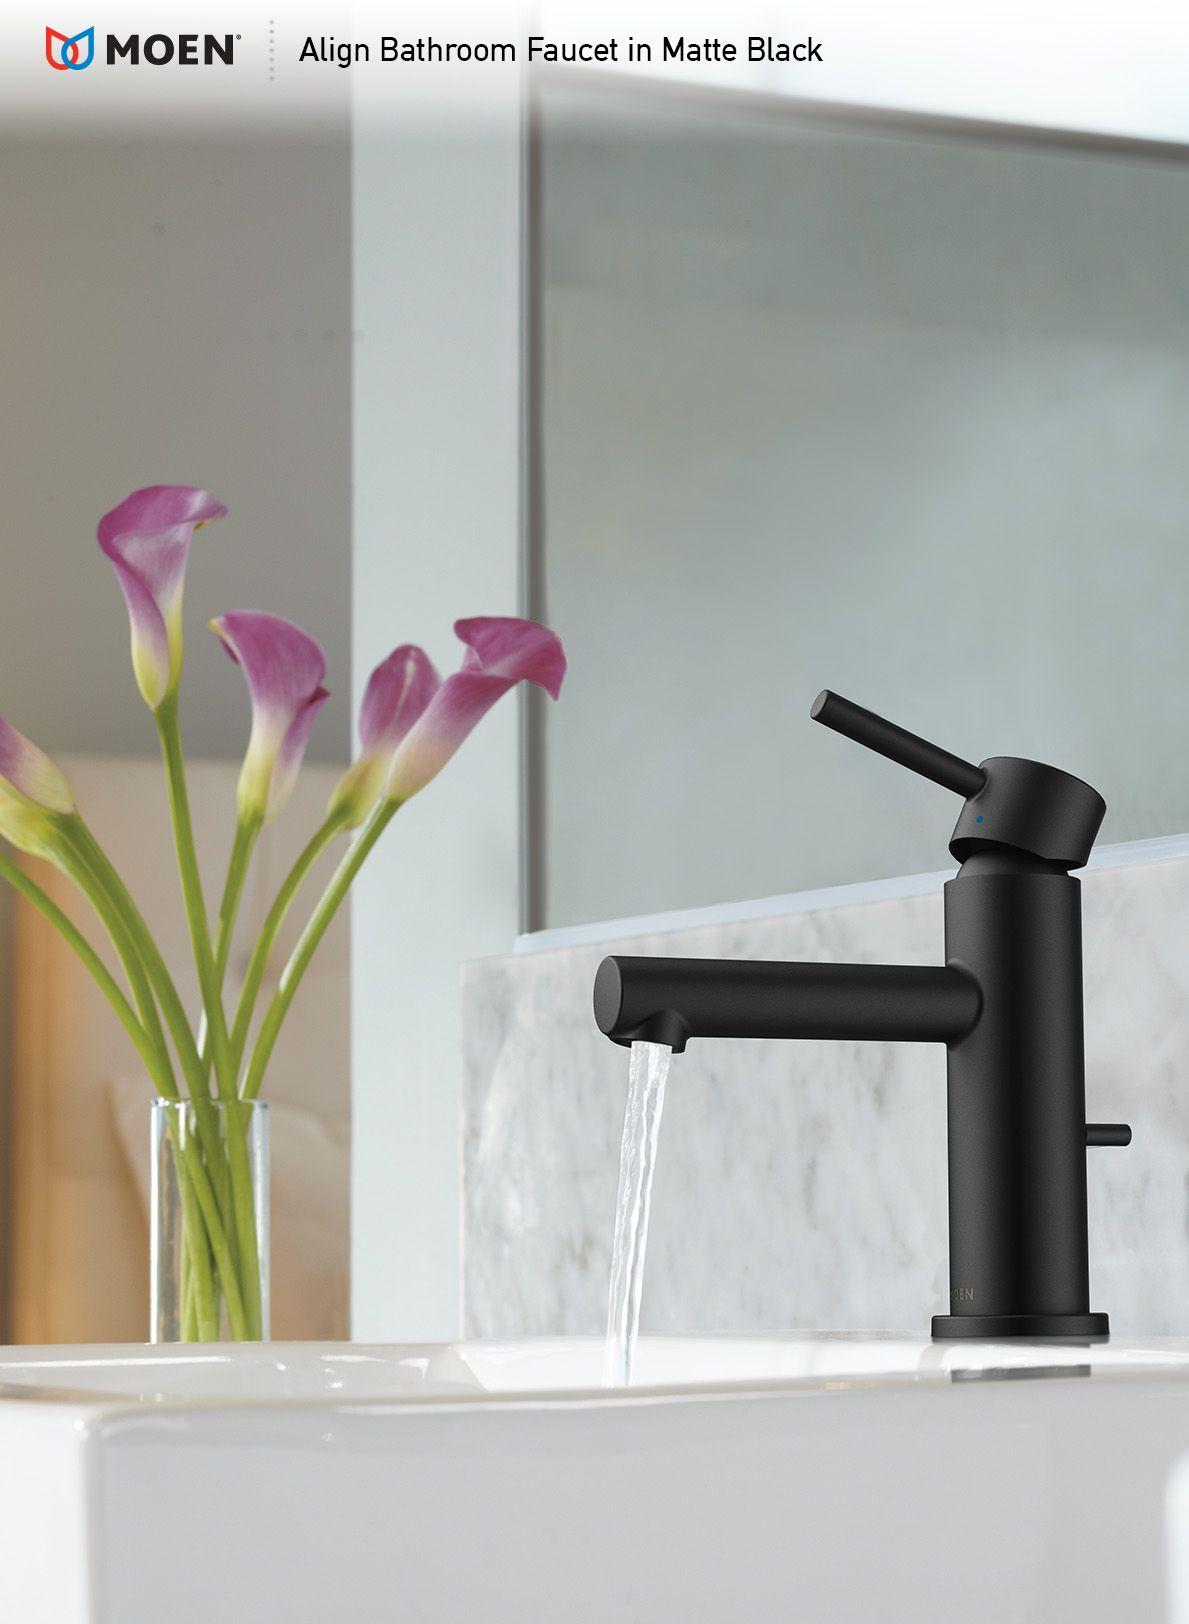 Align Matte Black One Handle High Arc Bathroom Faucet Black